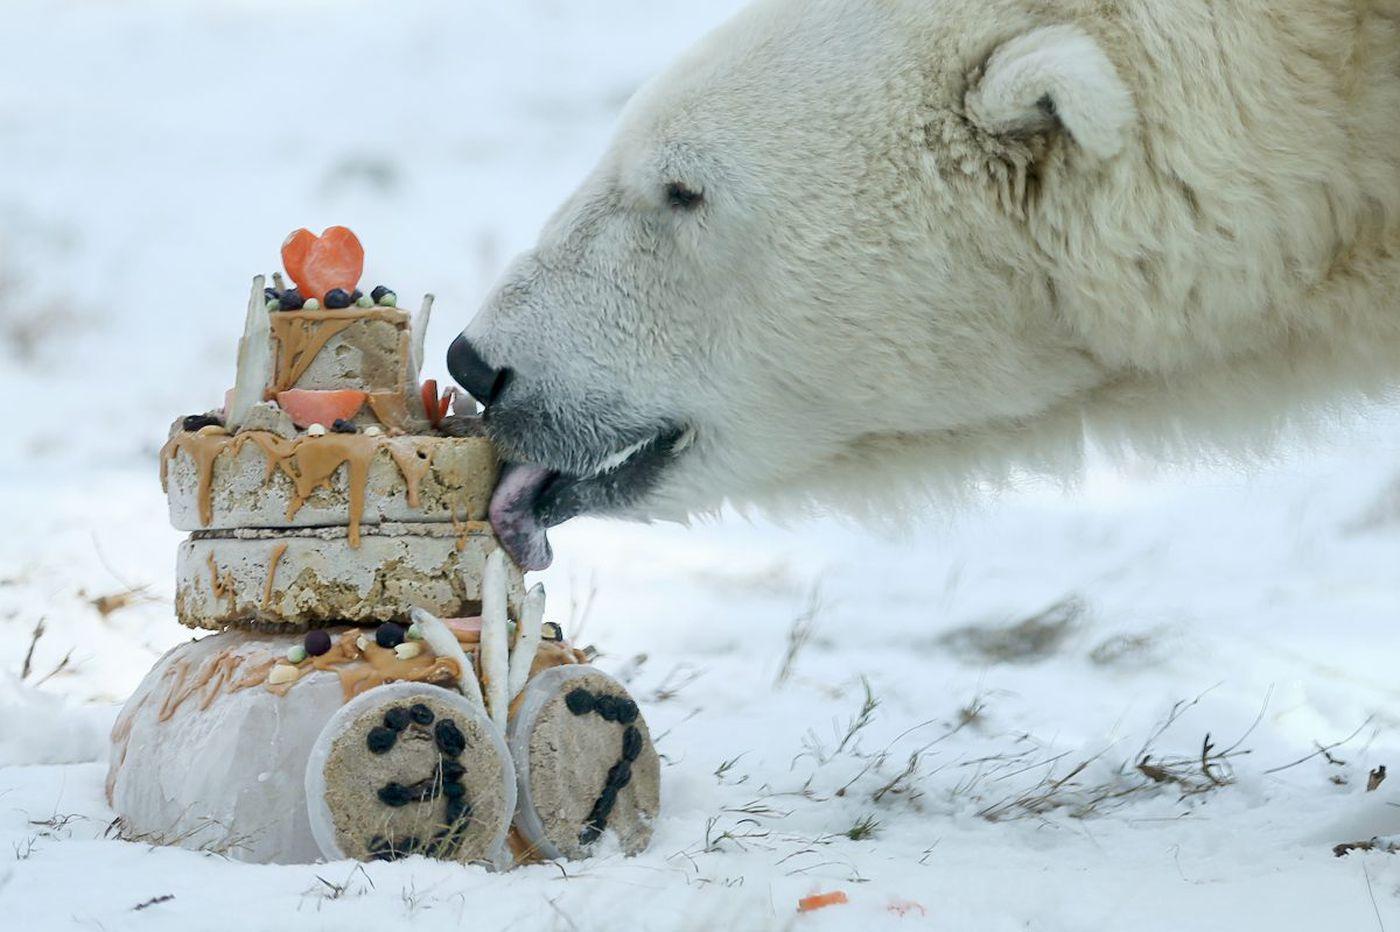 Oldest polar bear in the U.S. celebrates 37th birthday at the Philadelphia Zoo